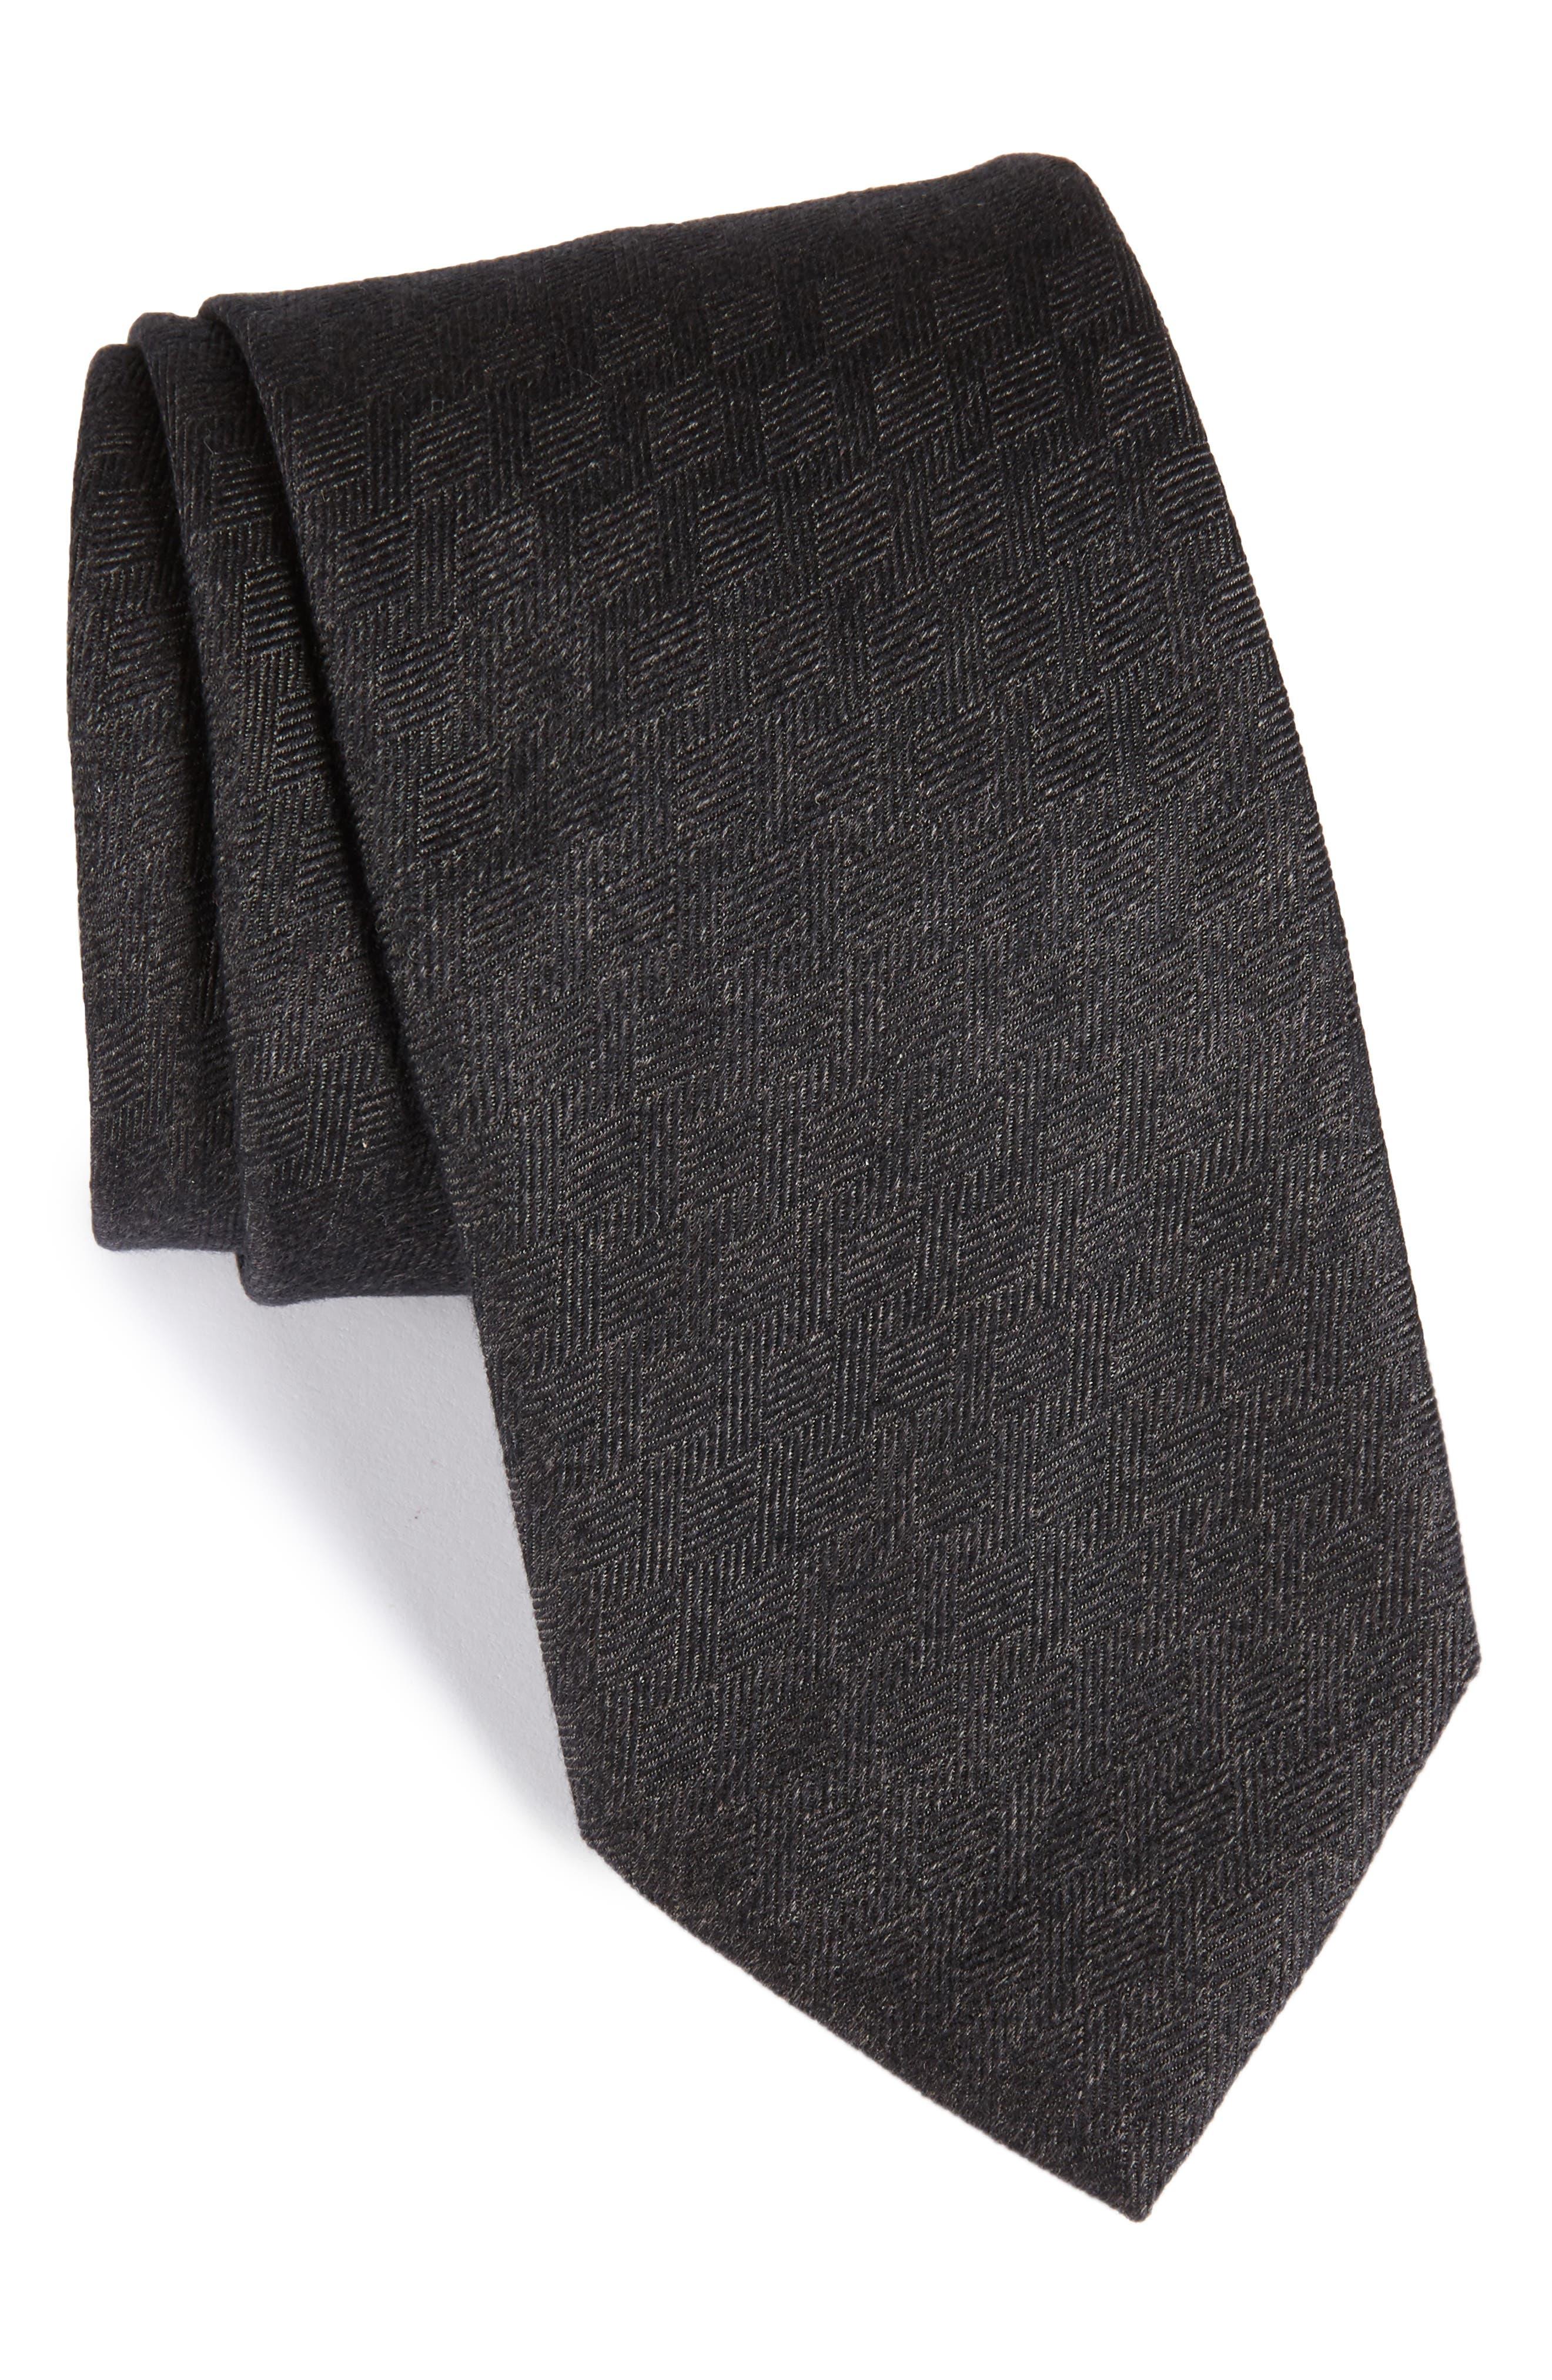 Alternate Image 1 Selected - Brioni Solid Silk Tie